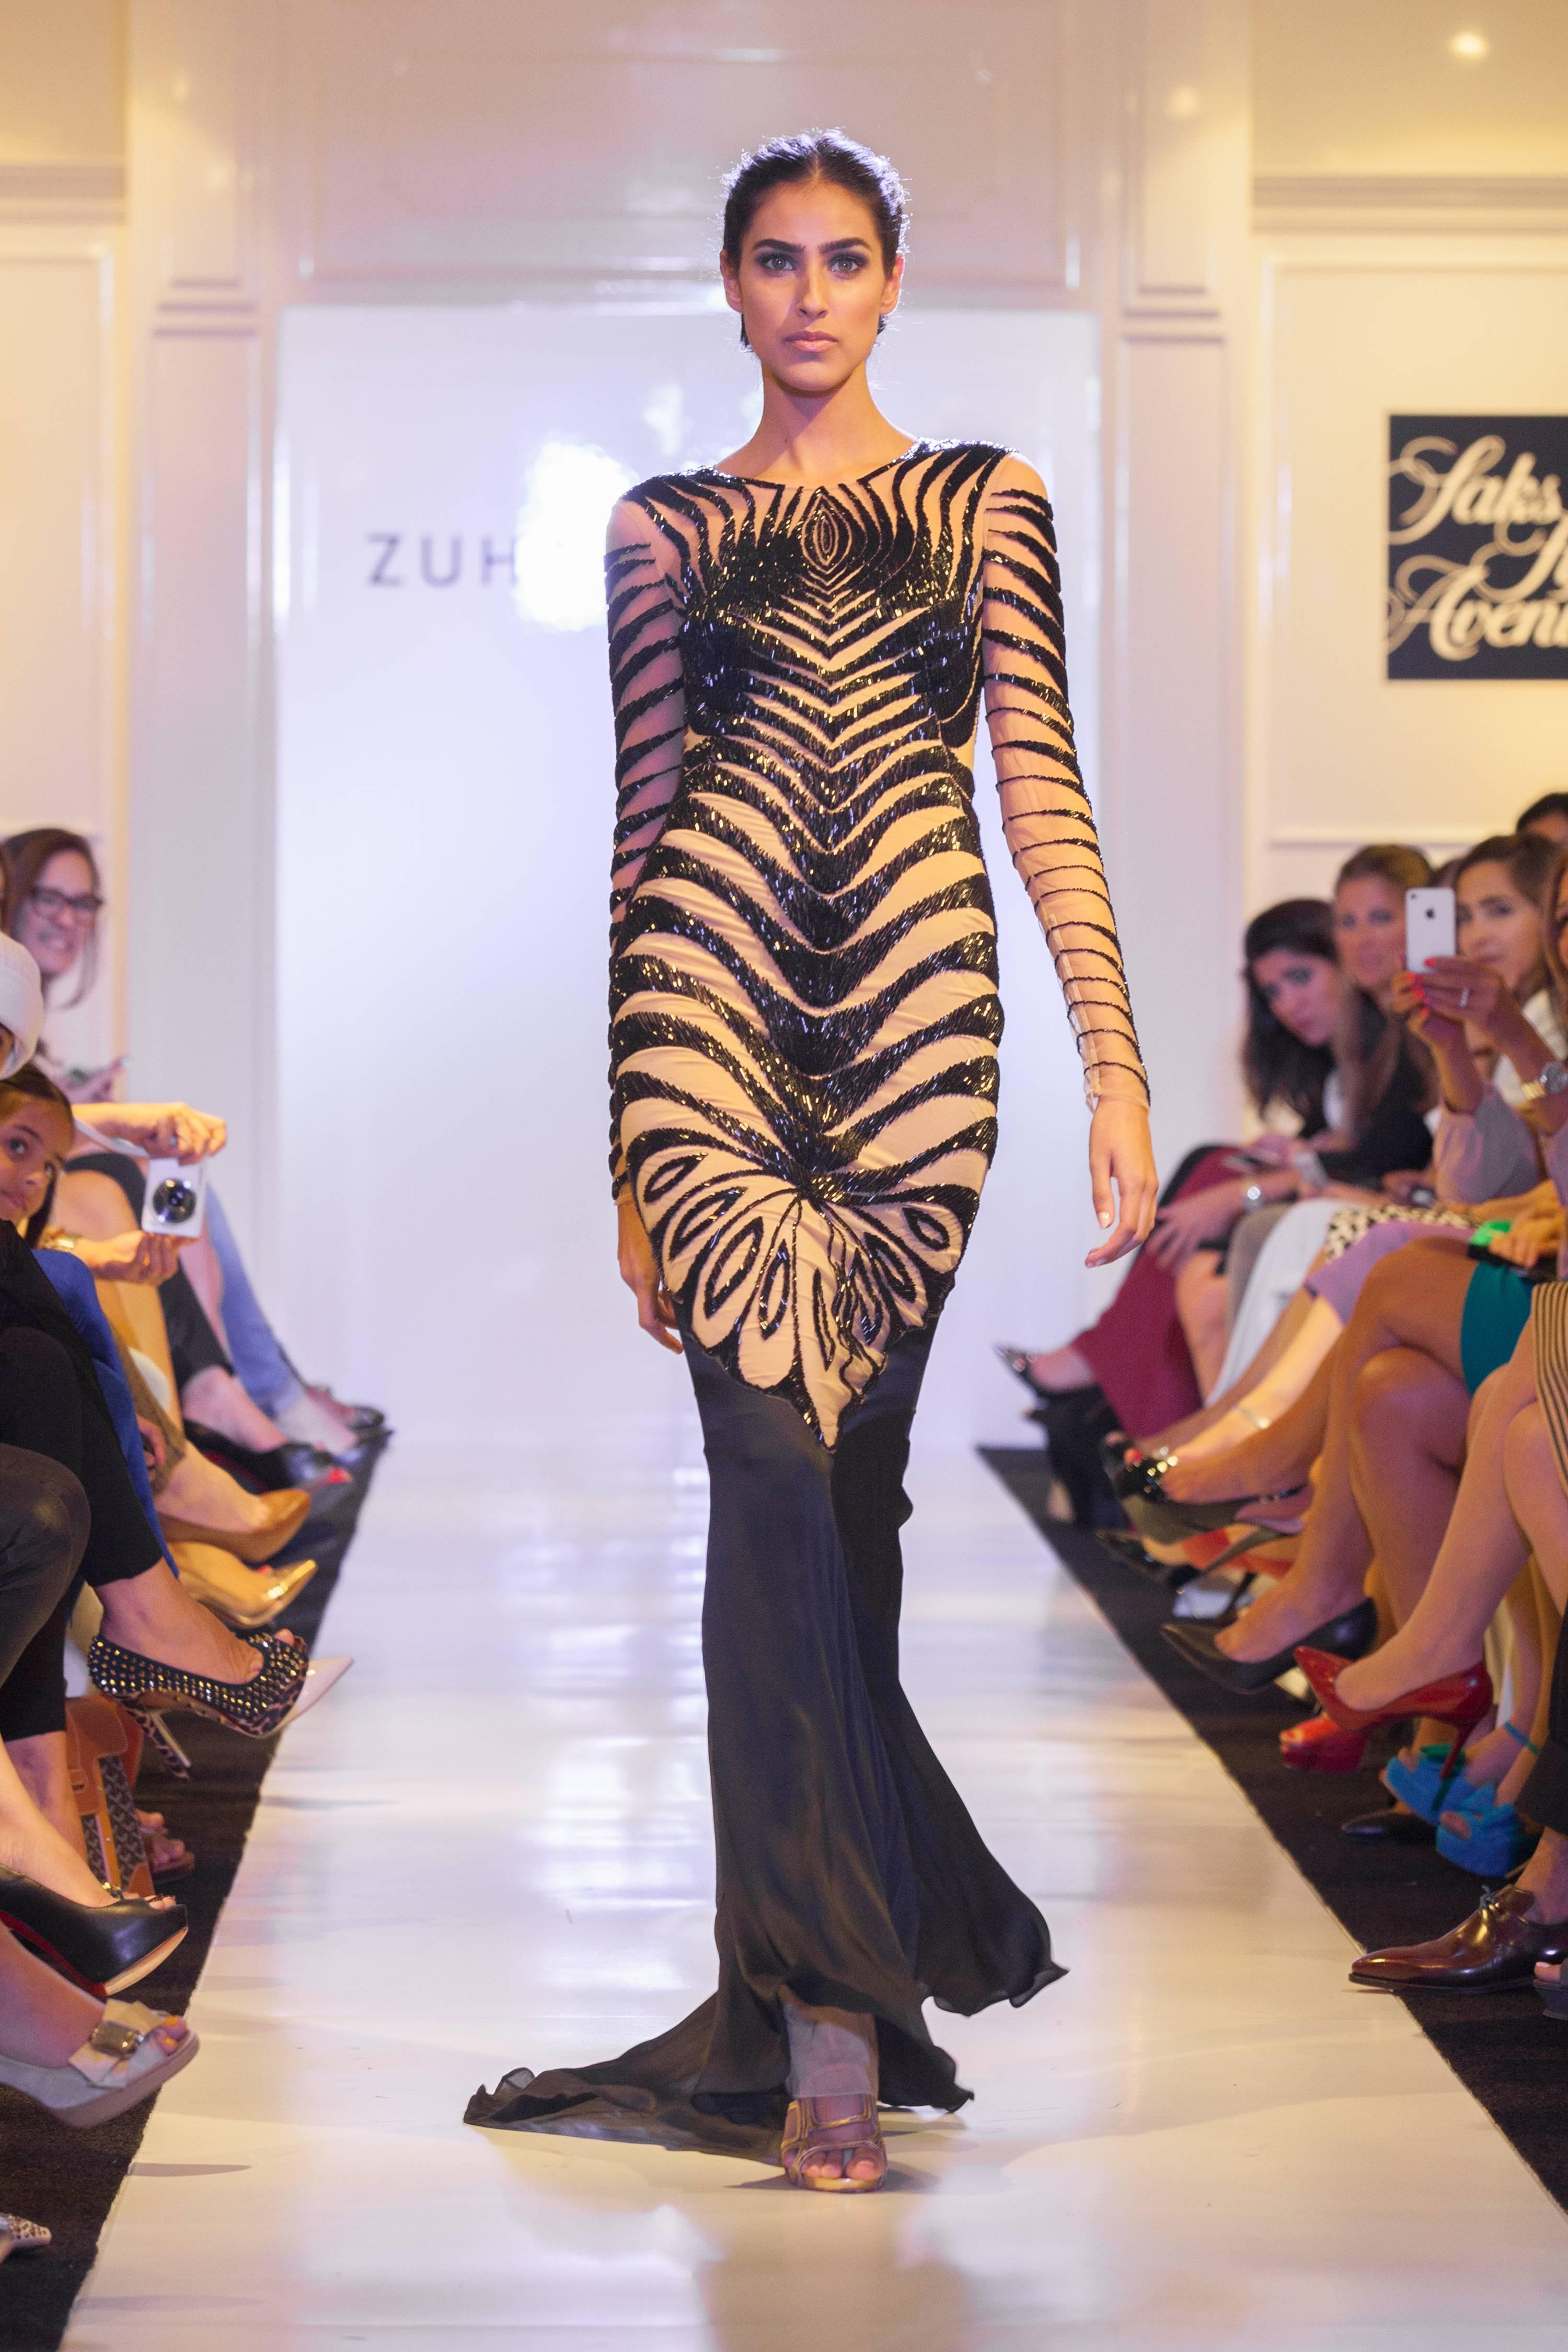 Zuhair Murad Presents Spring/Summer 14 Eveningwear at Saks Fifth ...